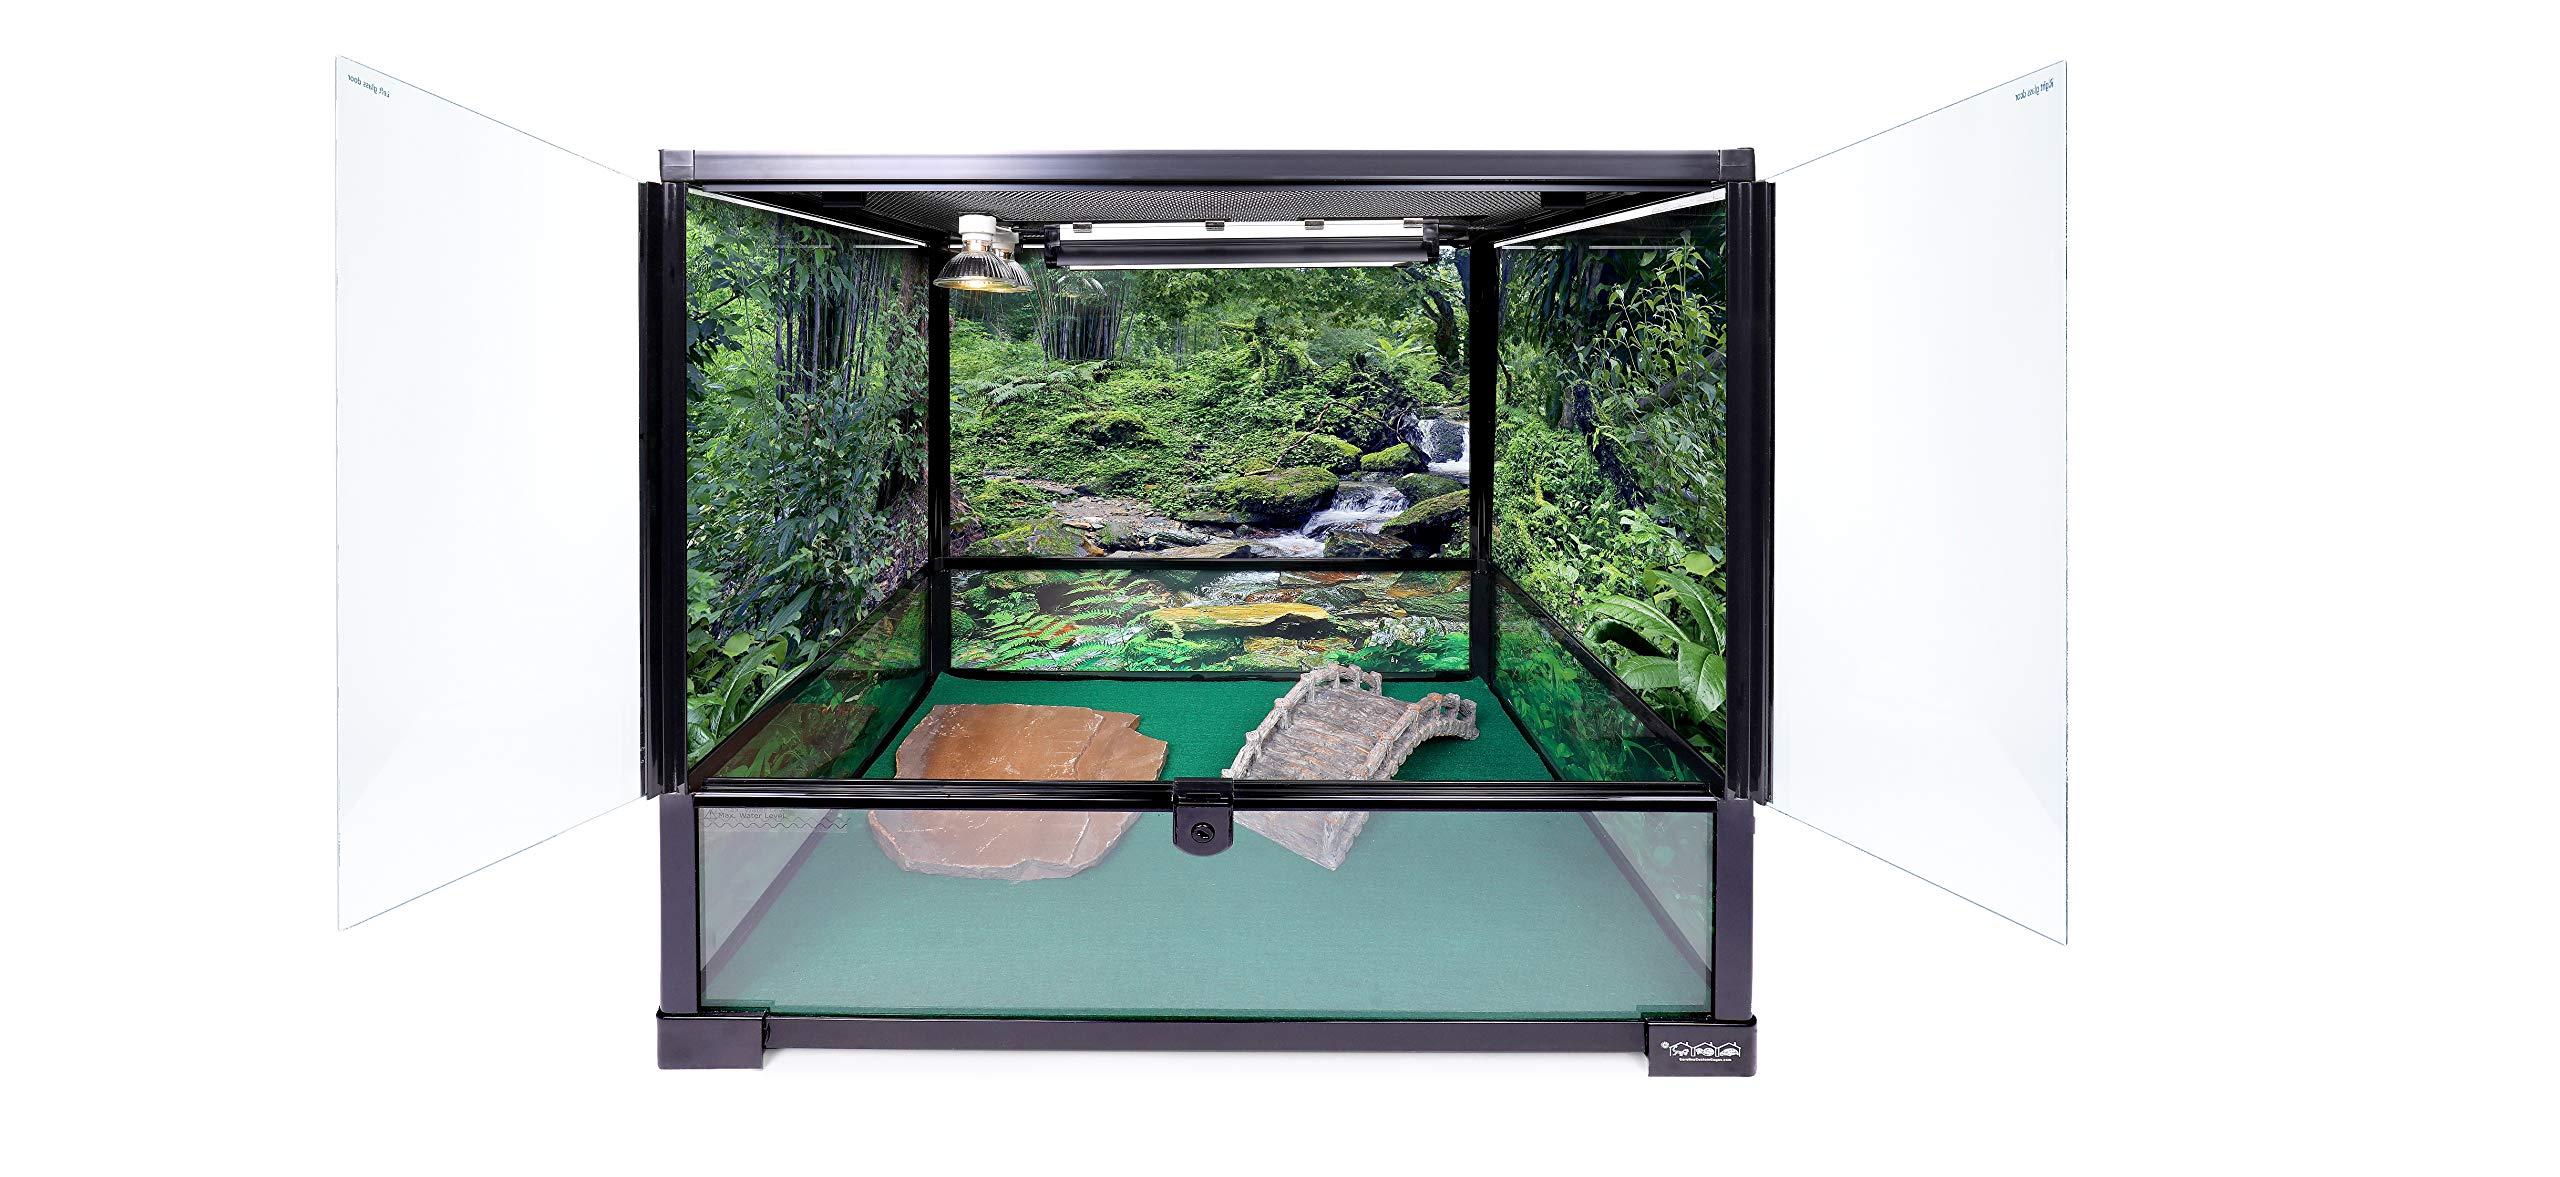 Carolina Custom Cages Terrarium, Tall Medium 24Lx18Dx24H; Easy Assembly by Carolina Custom Cages